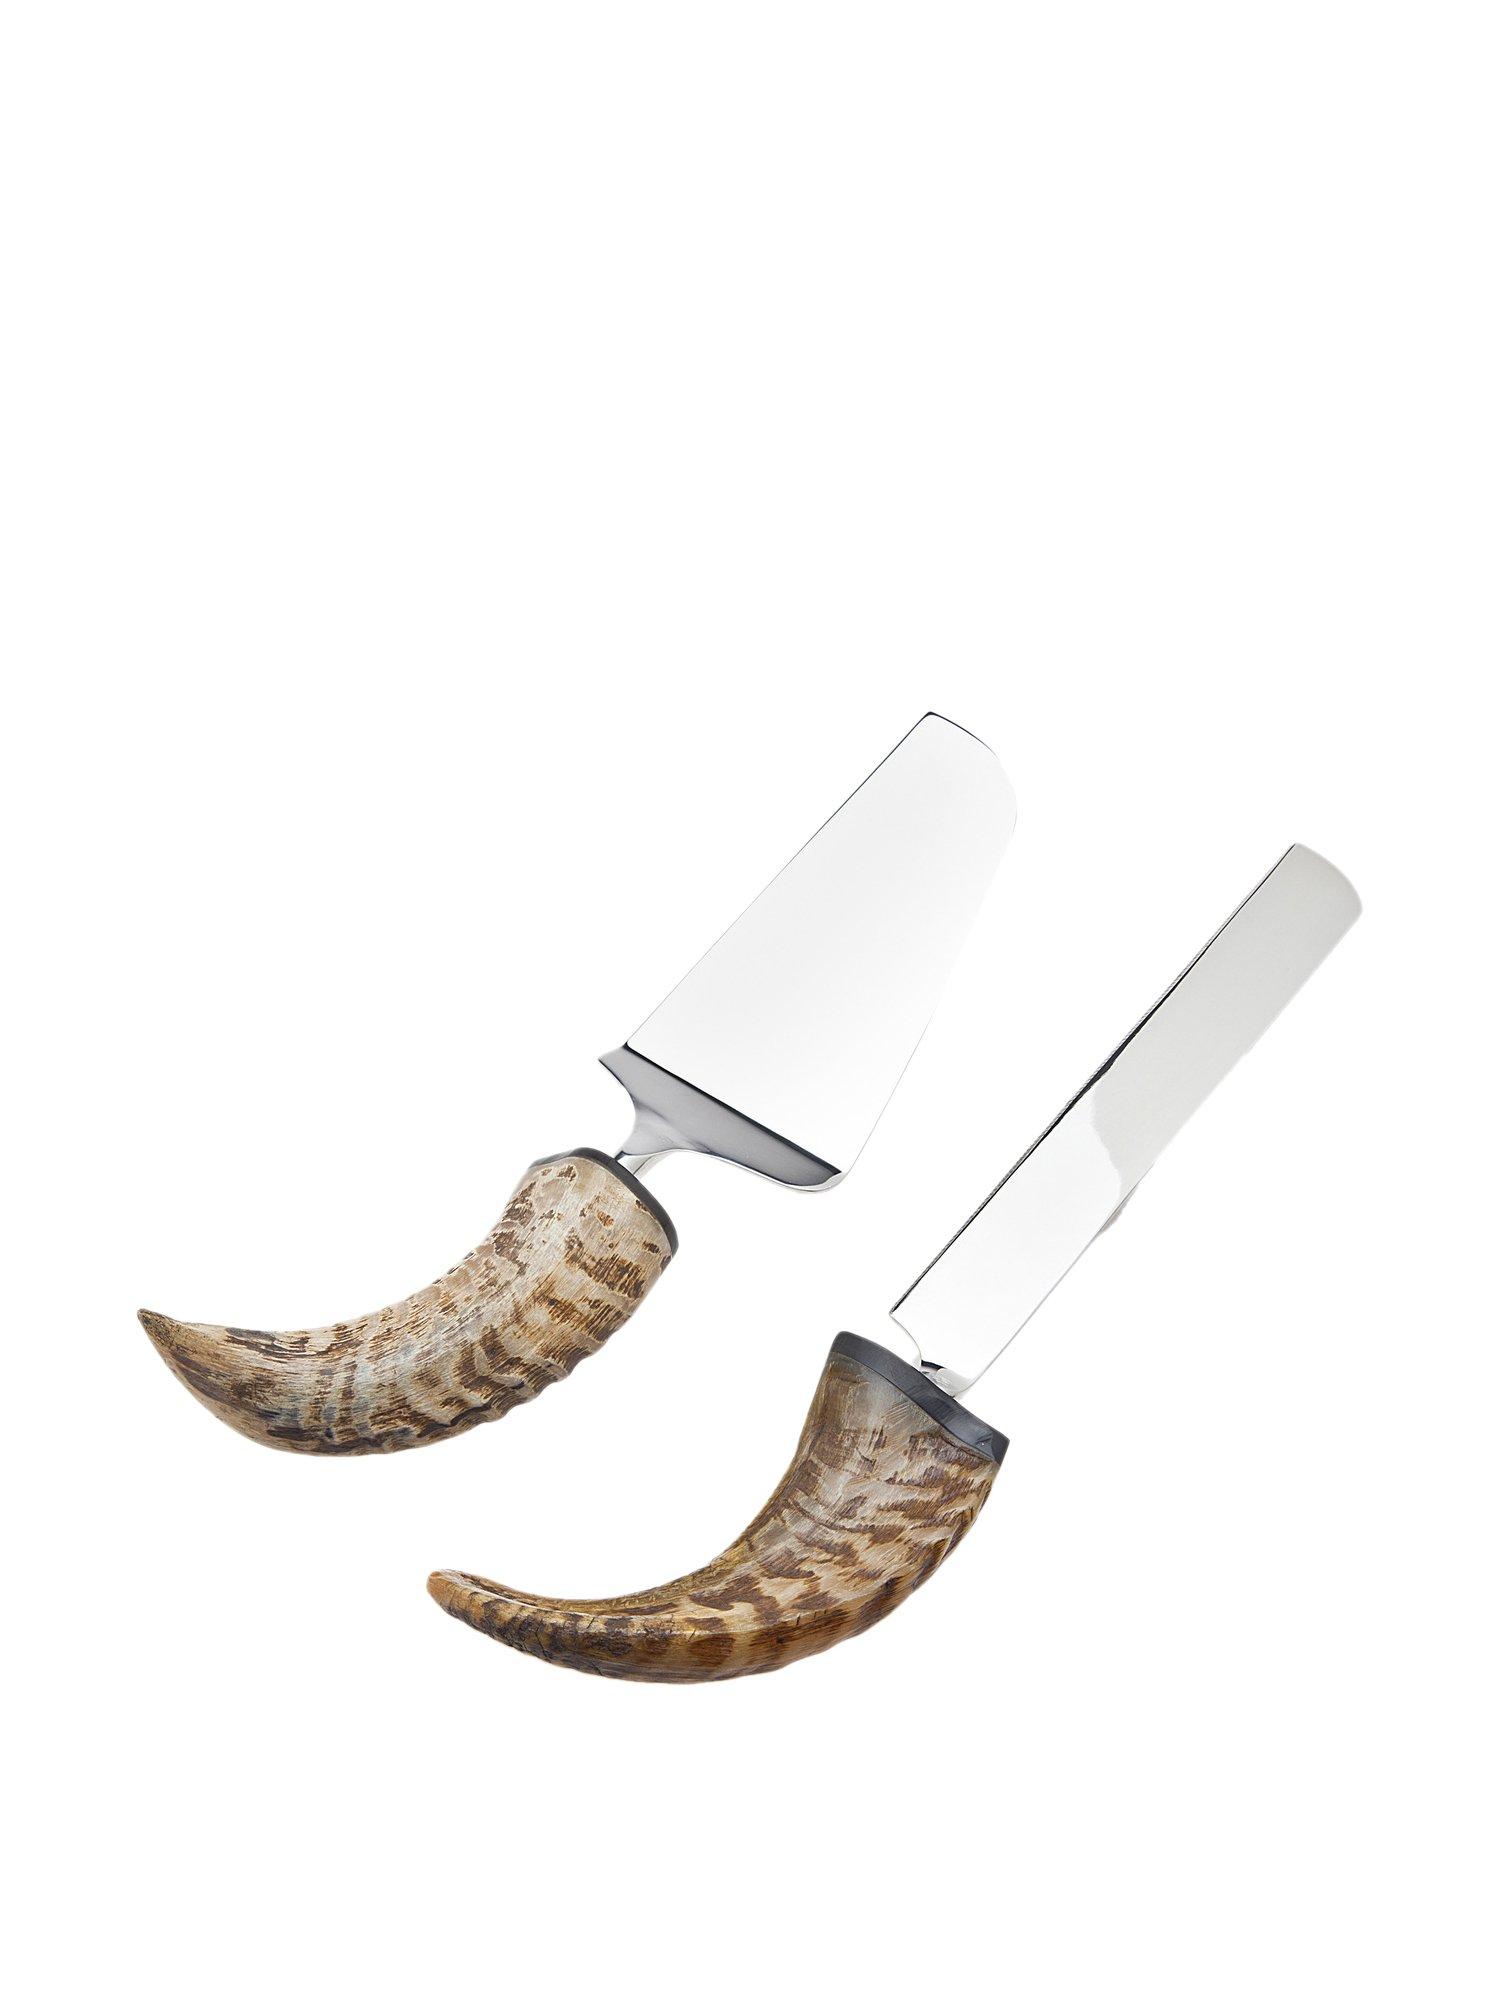 Godinger Silver Art Natural Animal Horn Nickel-plated Cake Knife Server Set